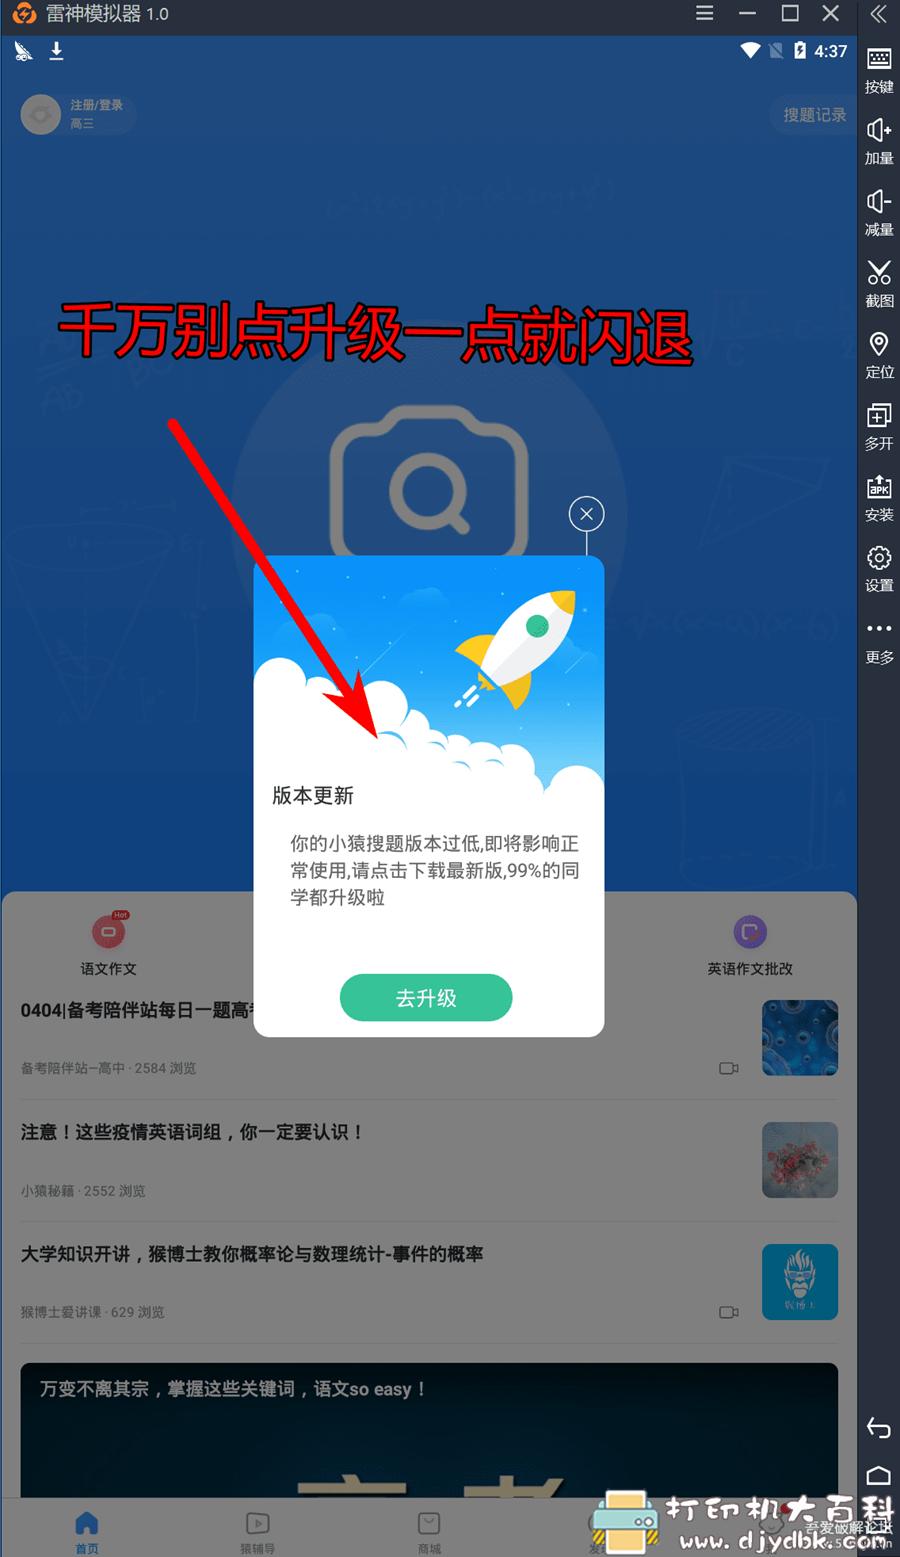 [Android]小猿搜题电脑模拟器安装版图片 No.2